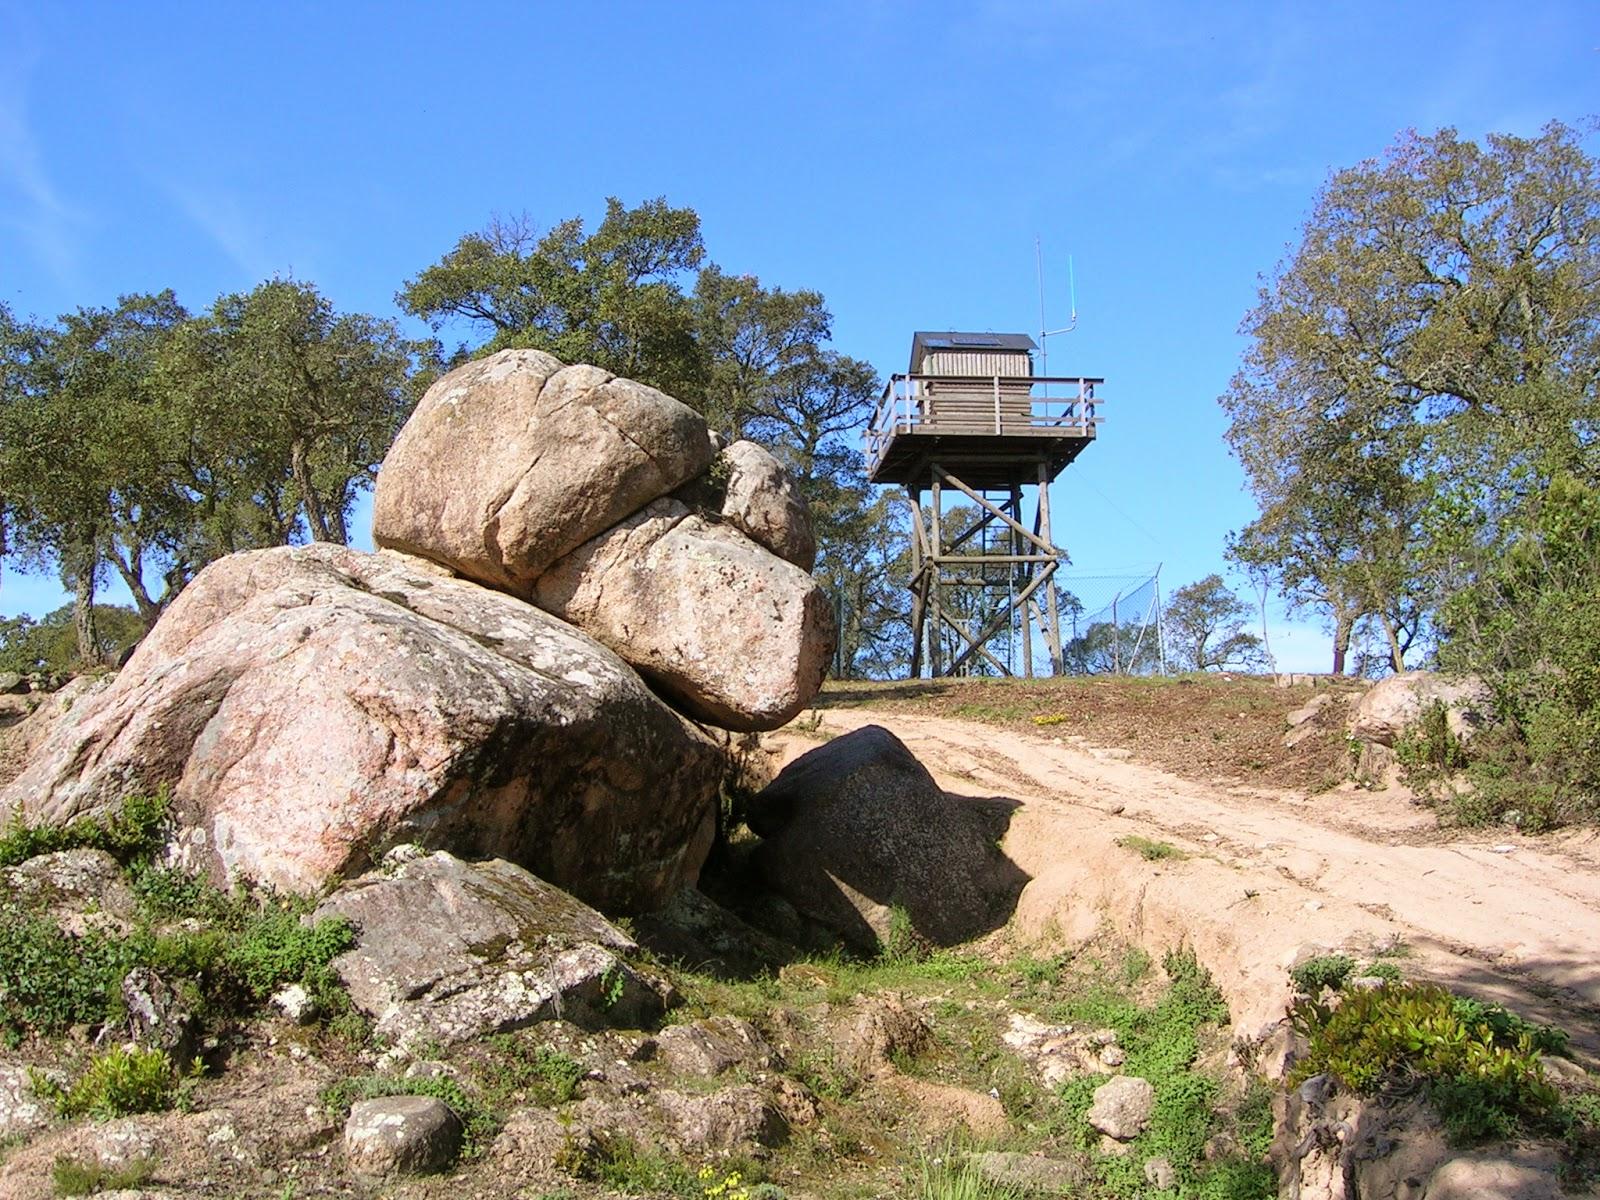 Montbarbat Es Terme Gros (El repte dels 100 cims)